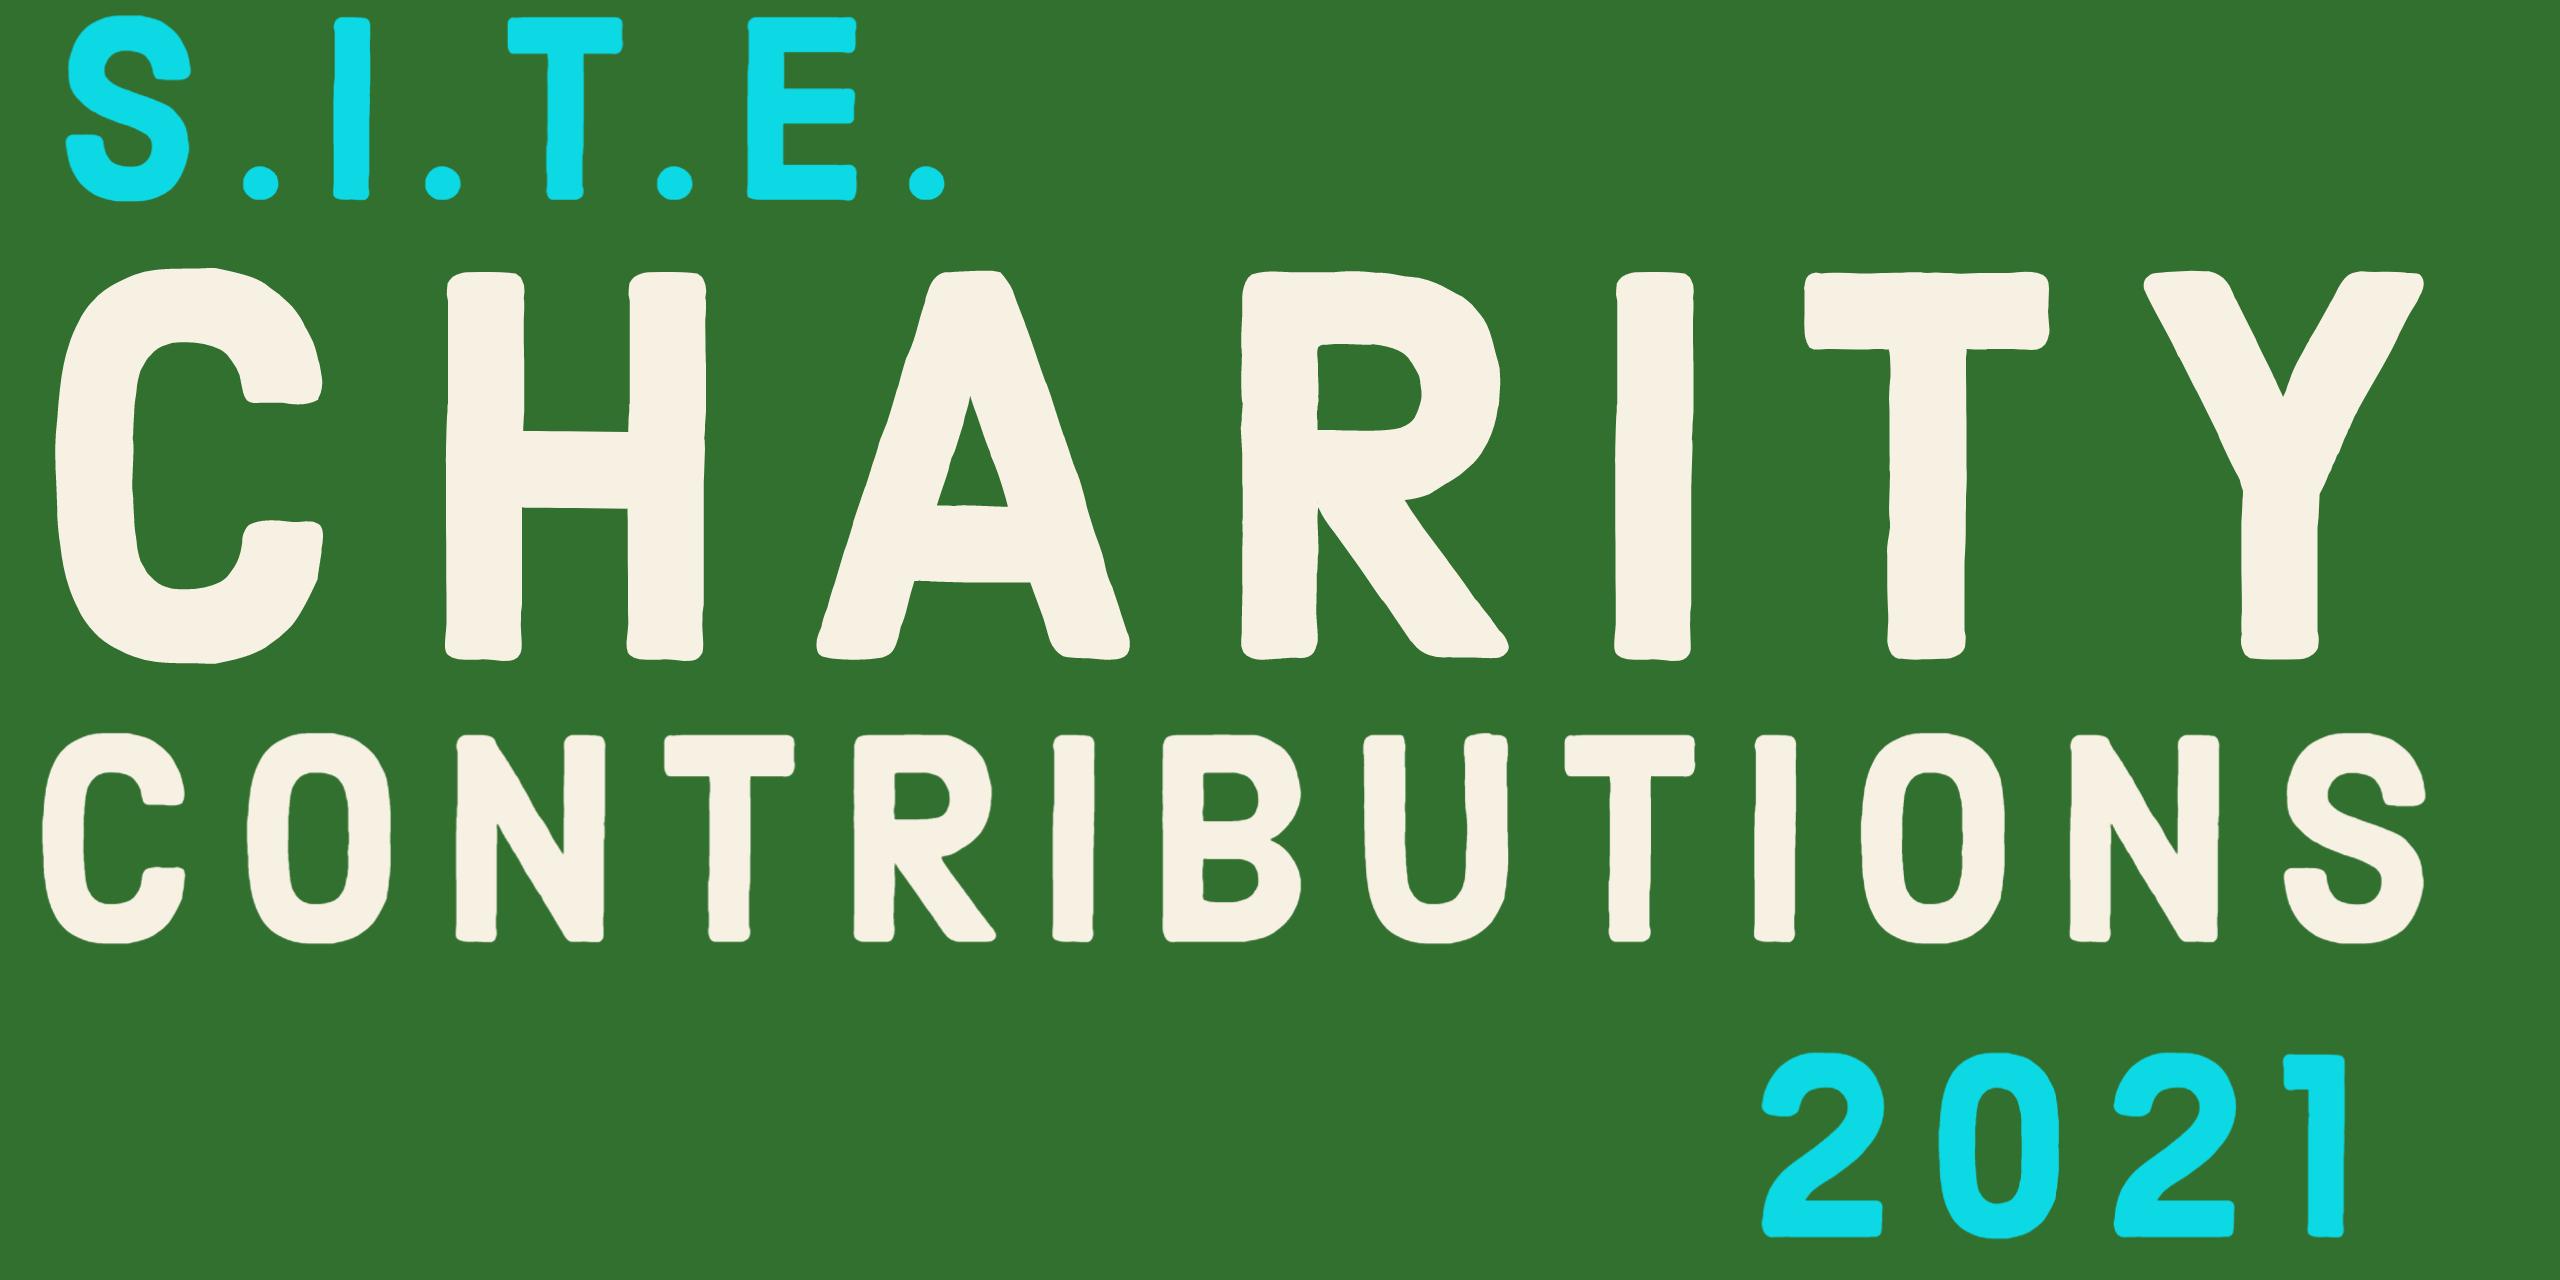 S.I.T.E. Donations & Deliveries